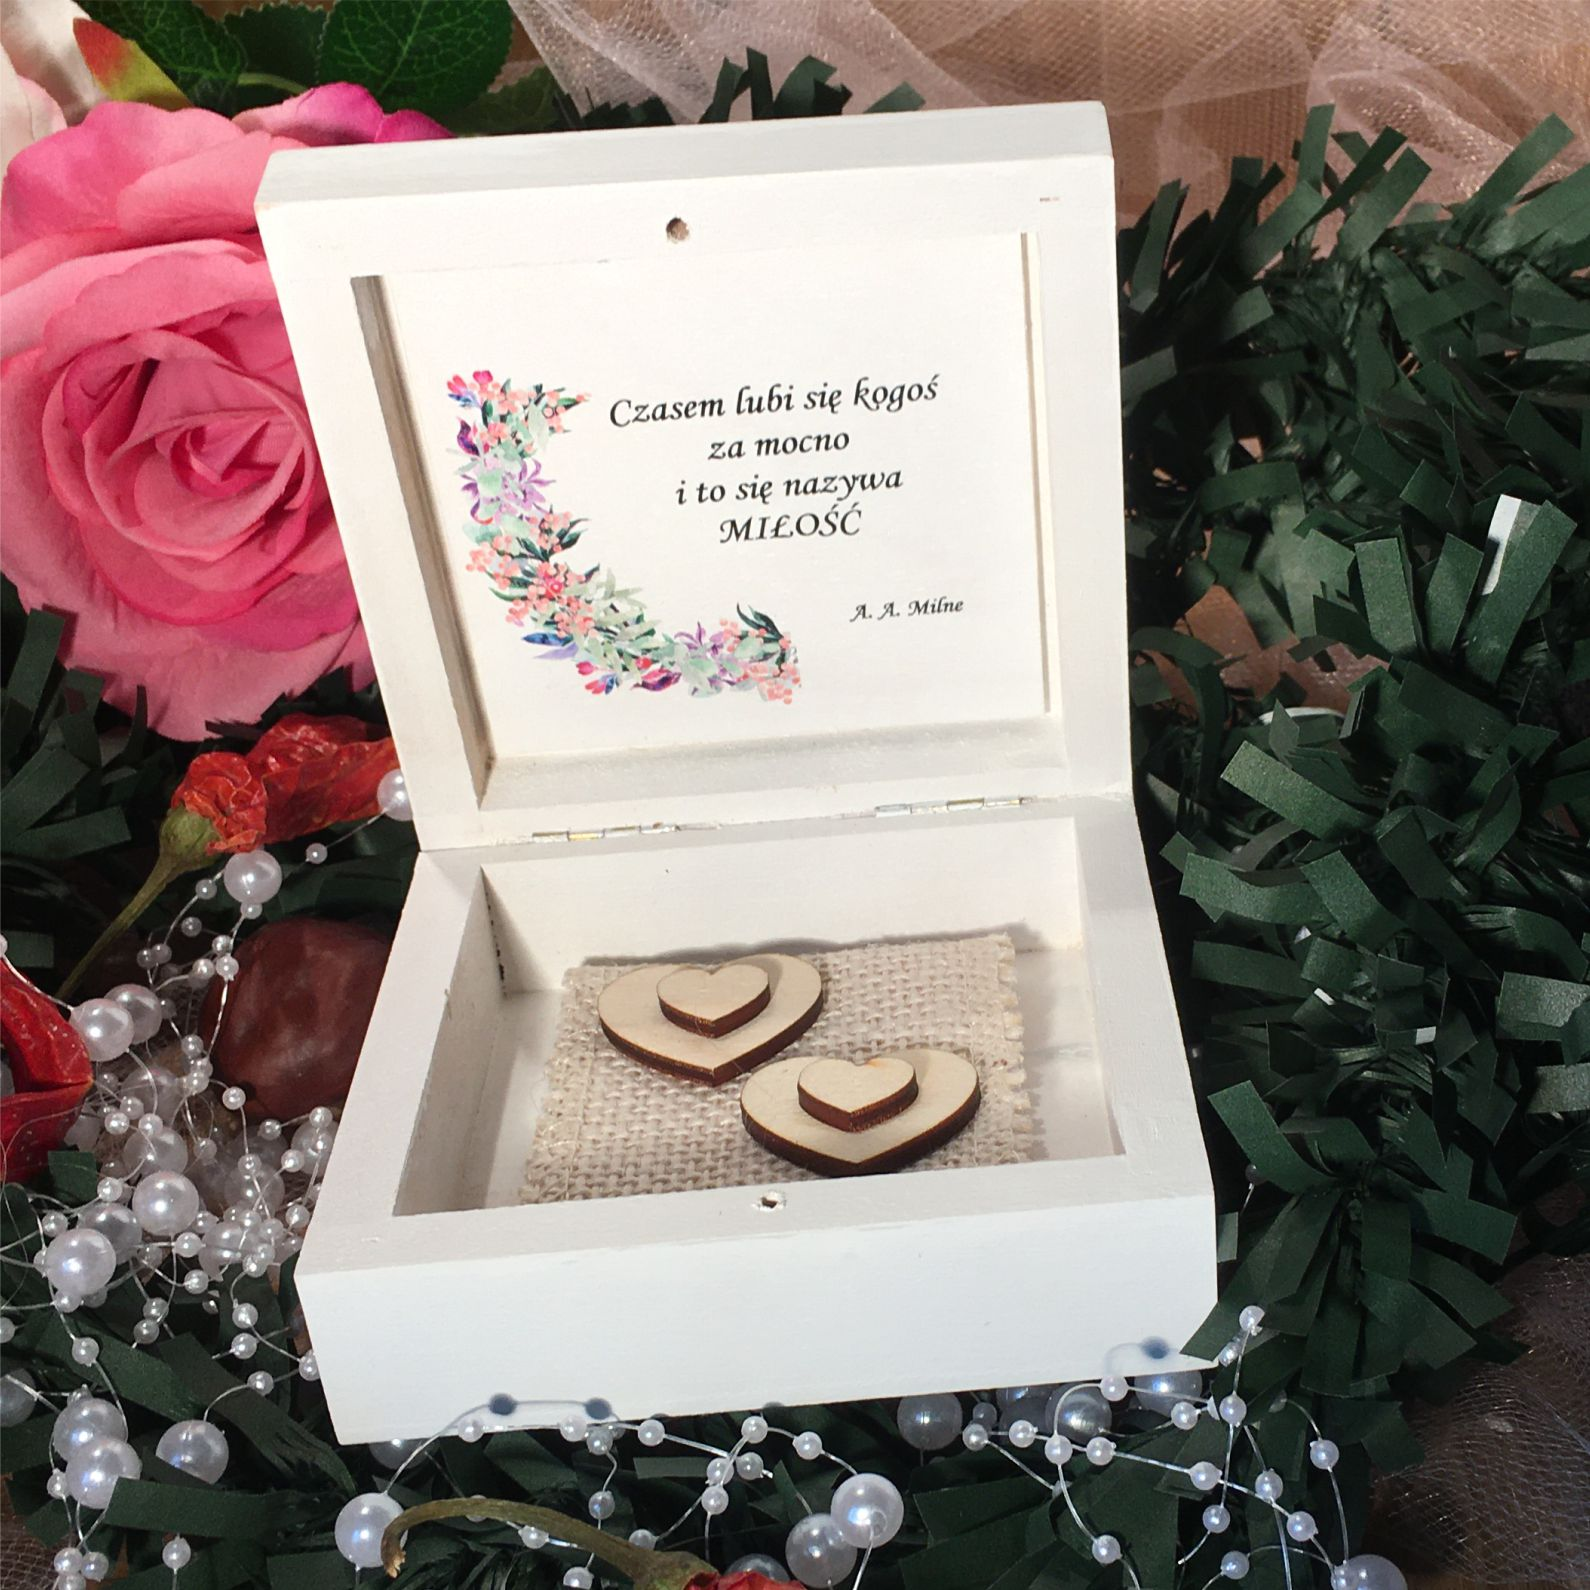 Środek pudełka kwiaty pastelowe